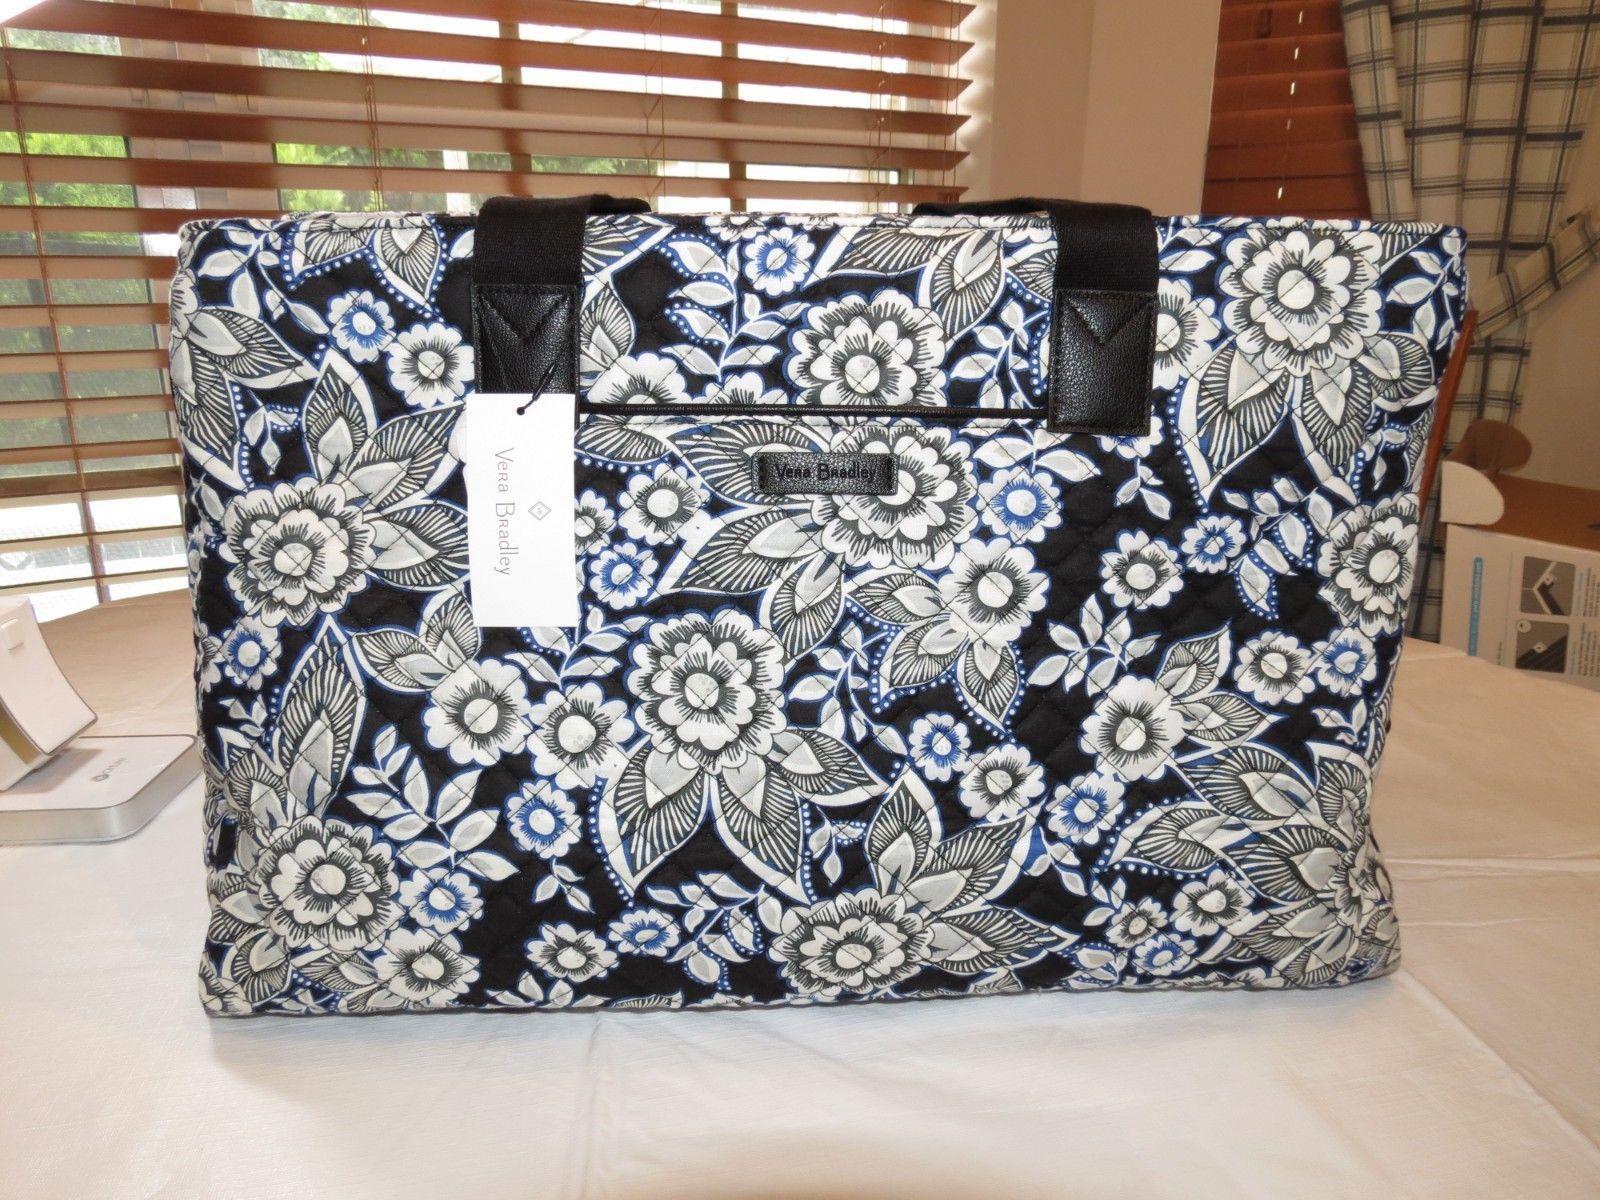 57. 57. Previous. Vera Bradley Iconic Triple Compartment Travel Bag  23609-166 Snow Lotus cotton. Vera ... 24e72518ae522